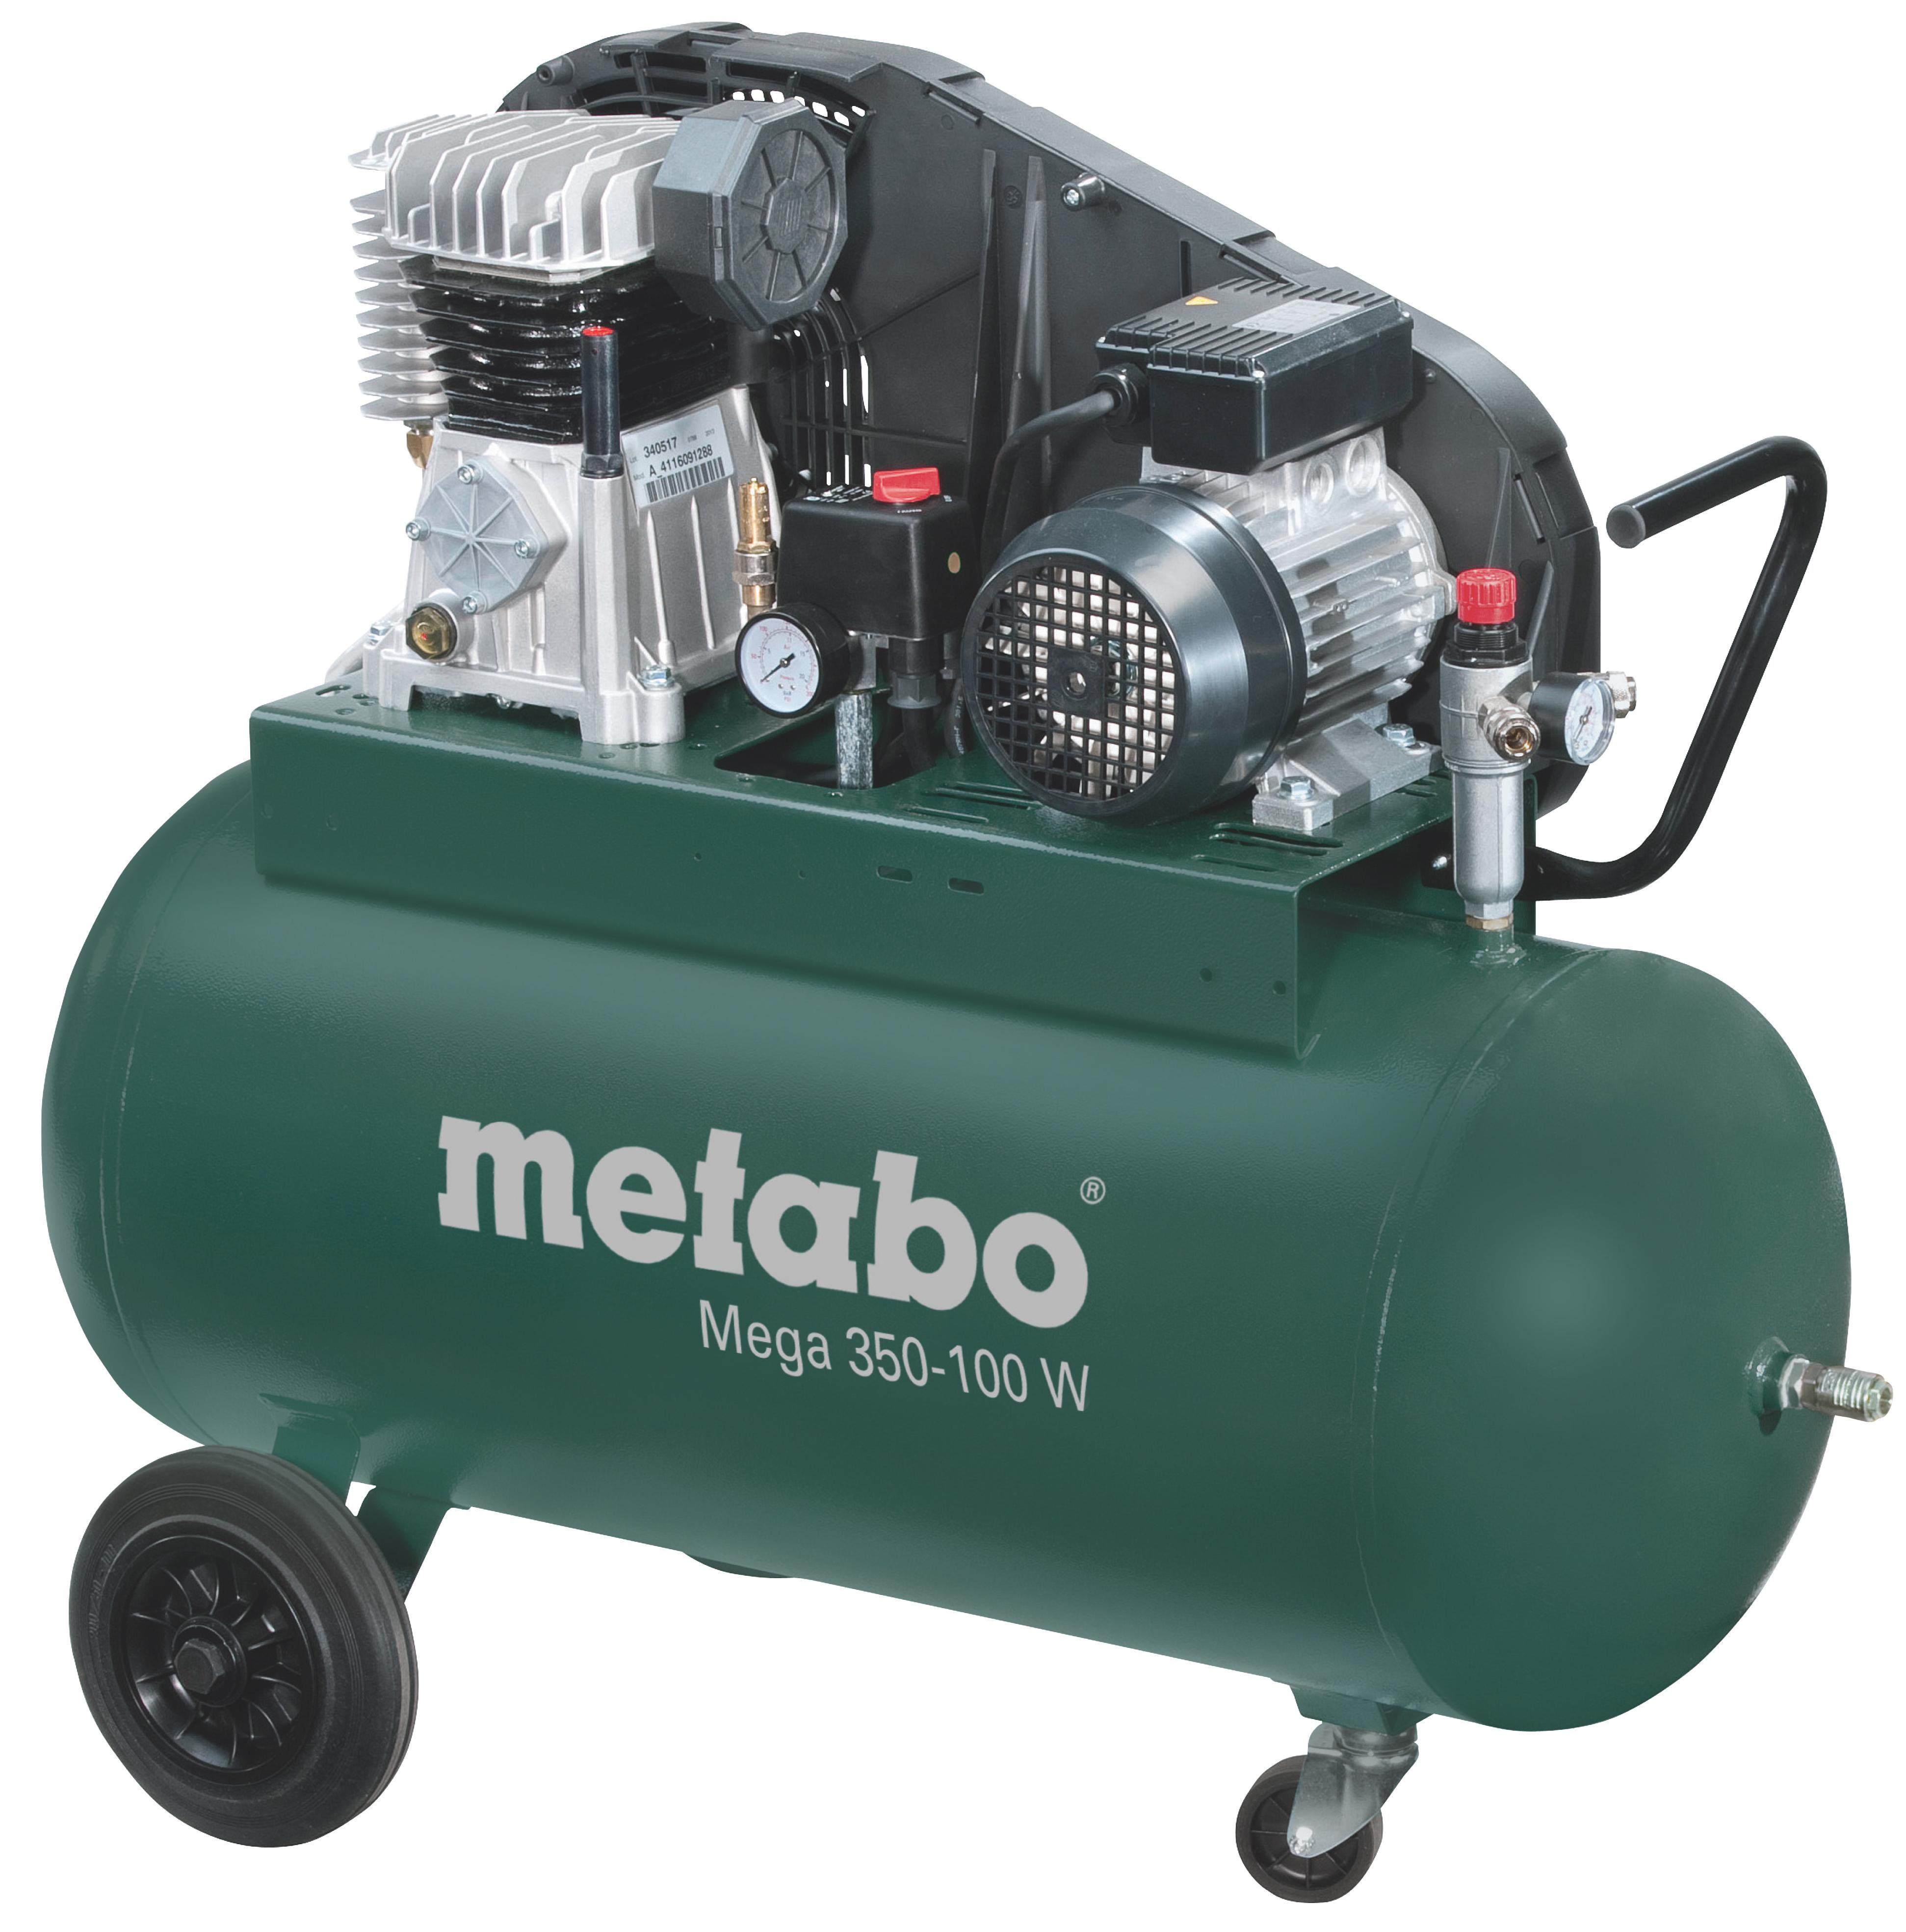 Metabo Mega 350-100 W kompresszor 90l, 2,2kW, 10bar